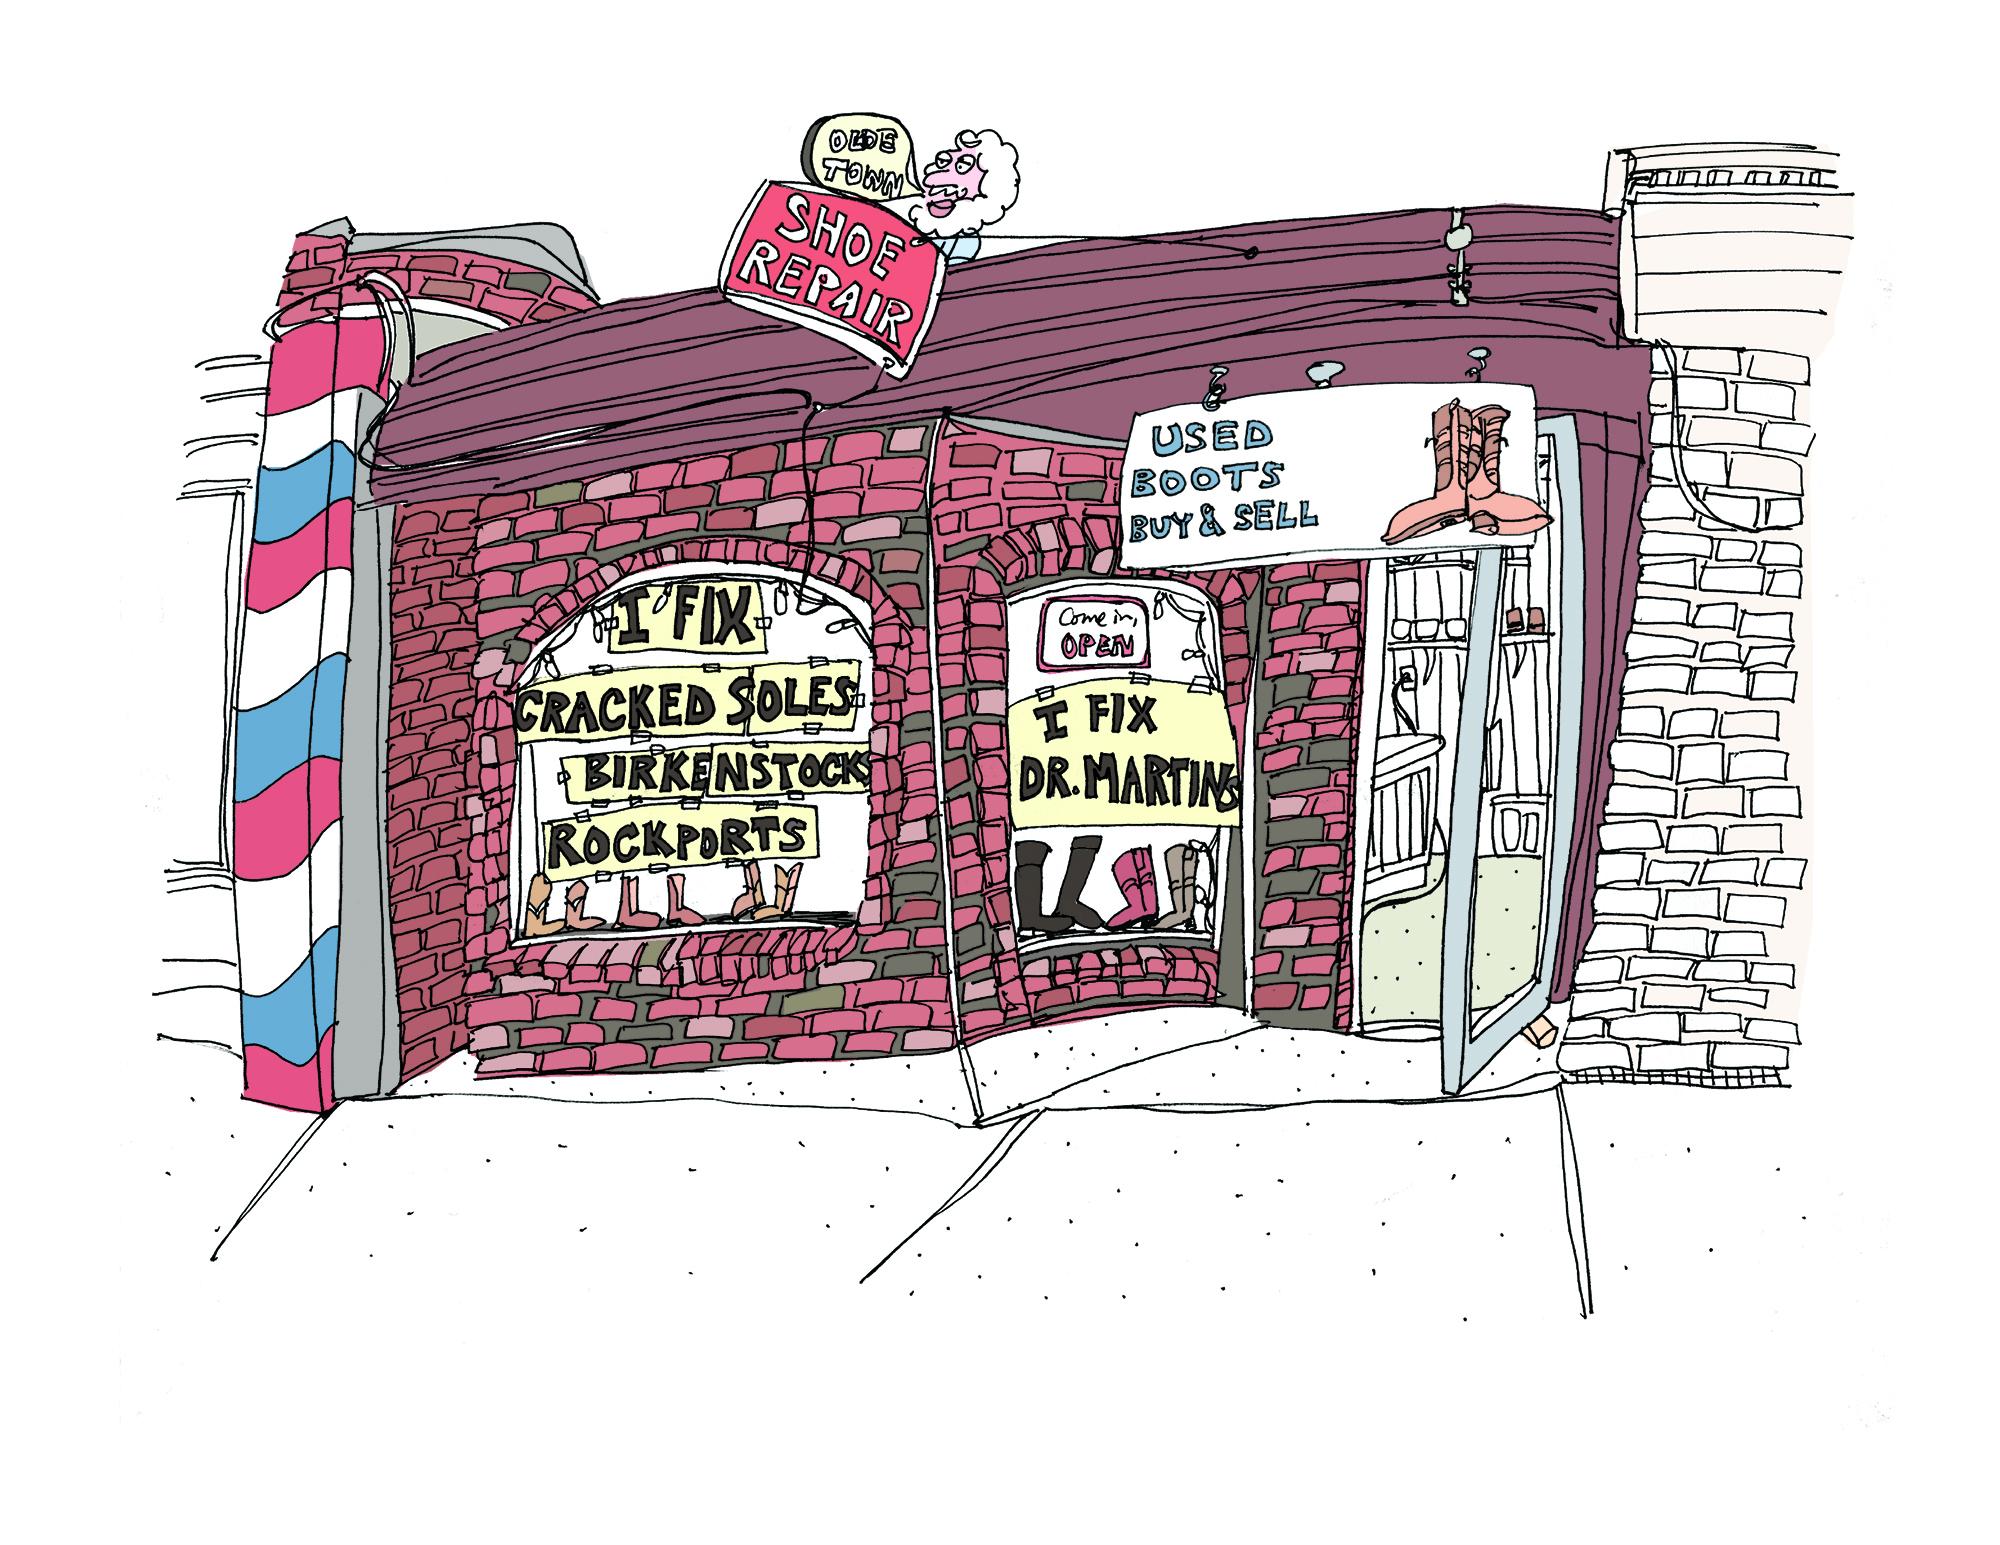 Drawing of Olde Town Shoe Repair storefront